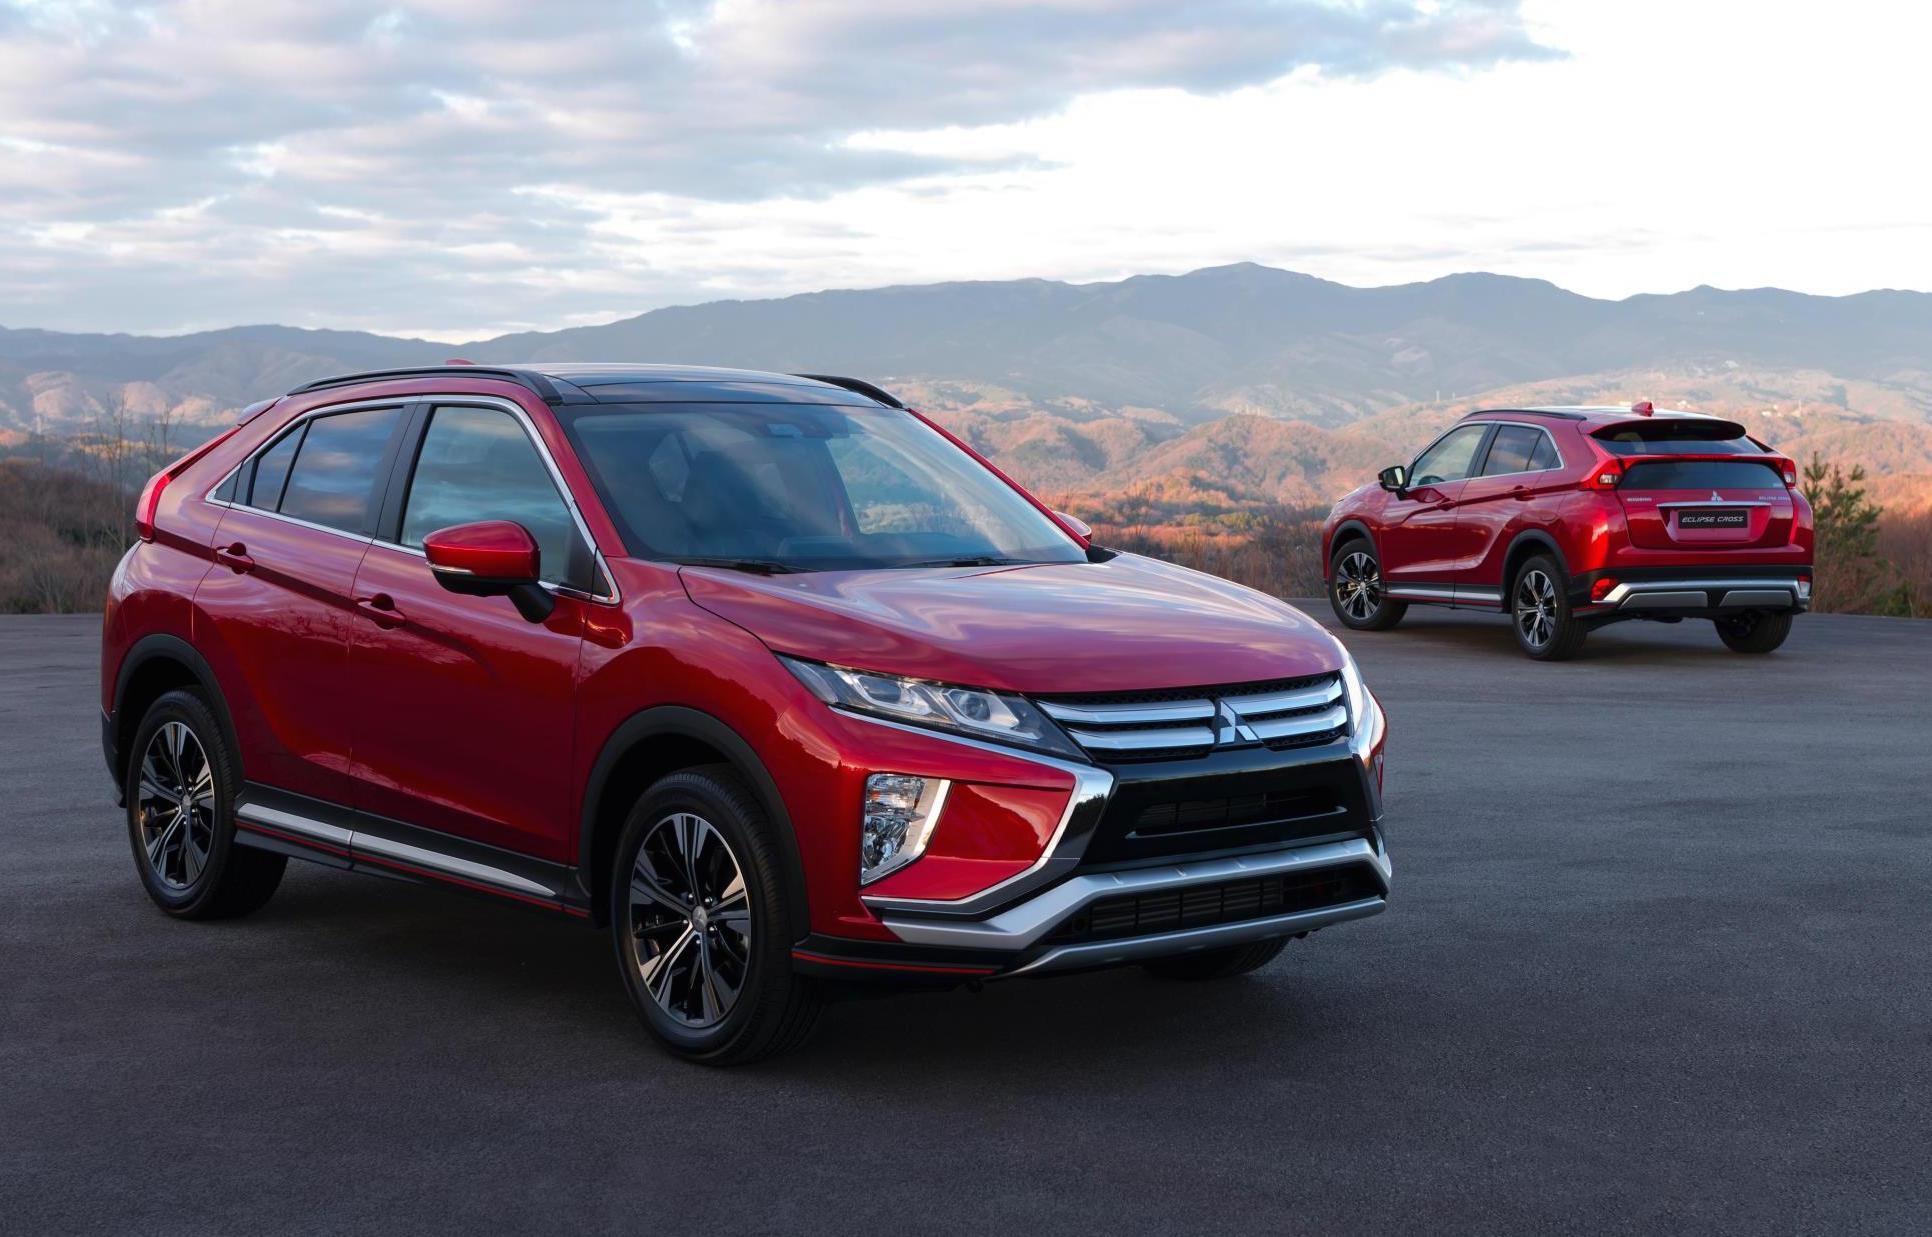 Hyundai Azera Prices In Uae Specs Reviews For Dubai ...